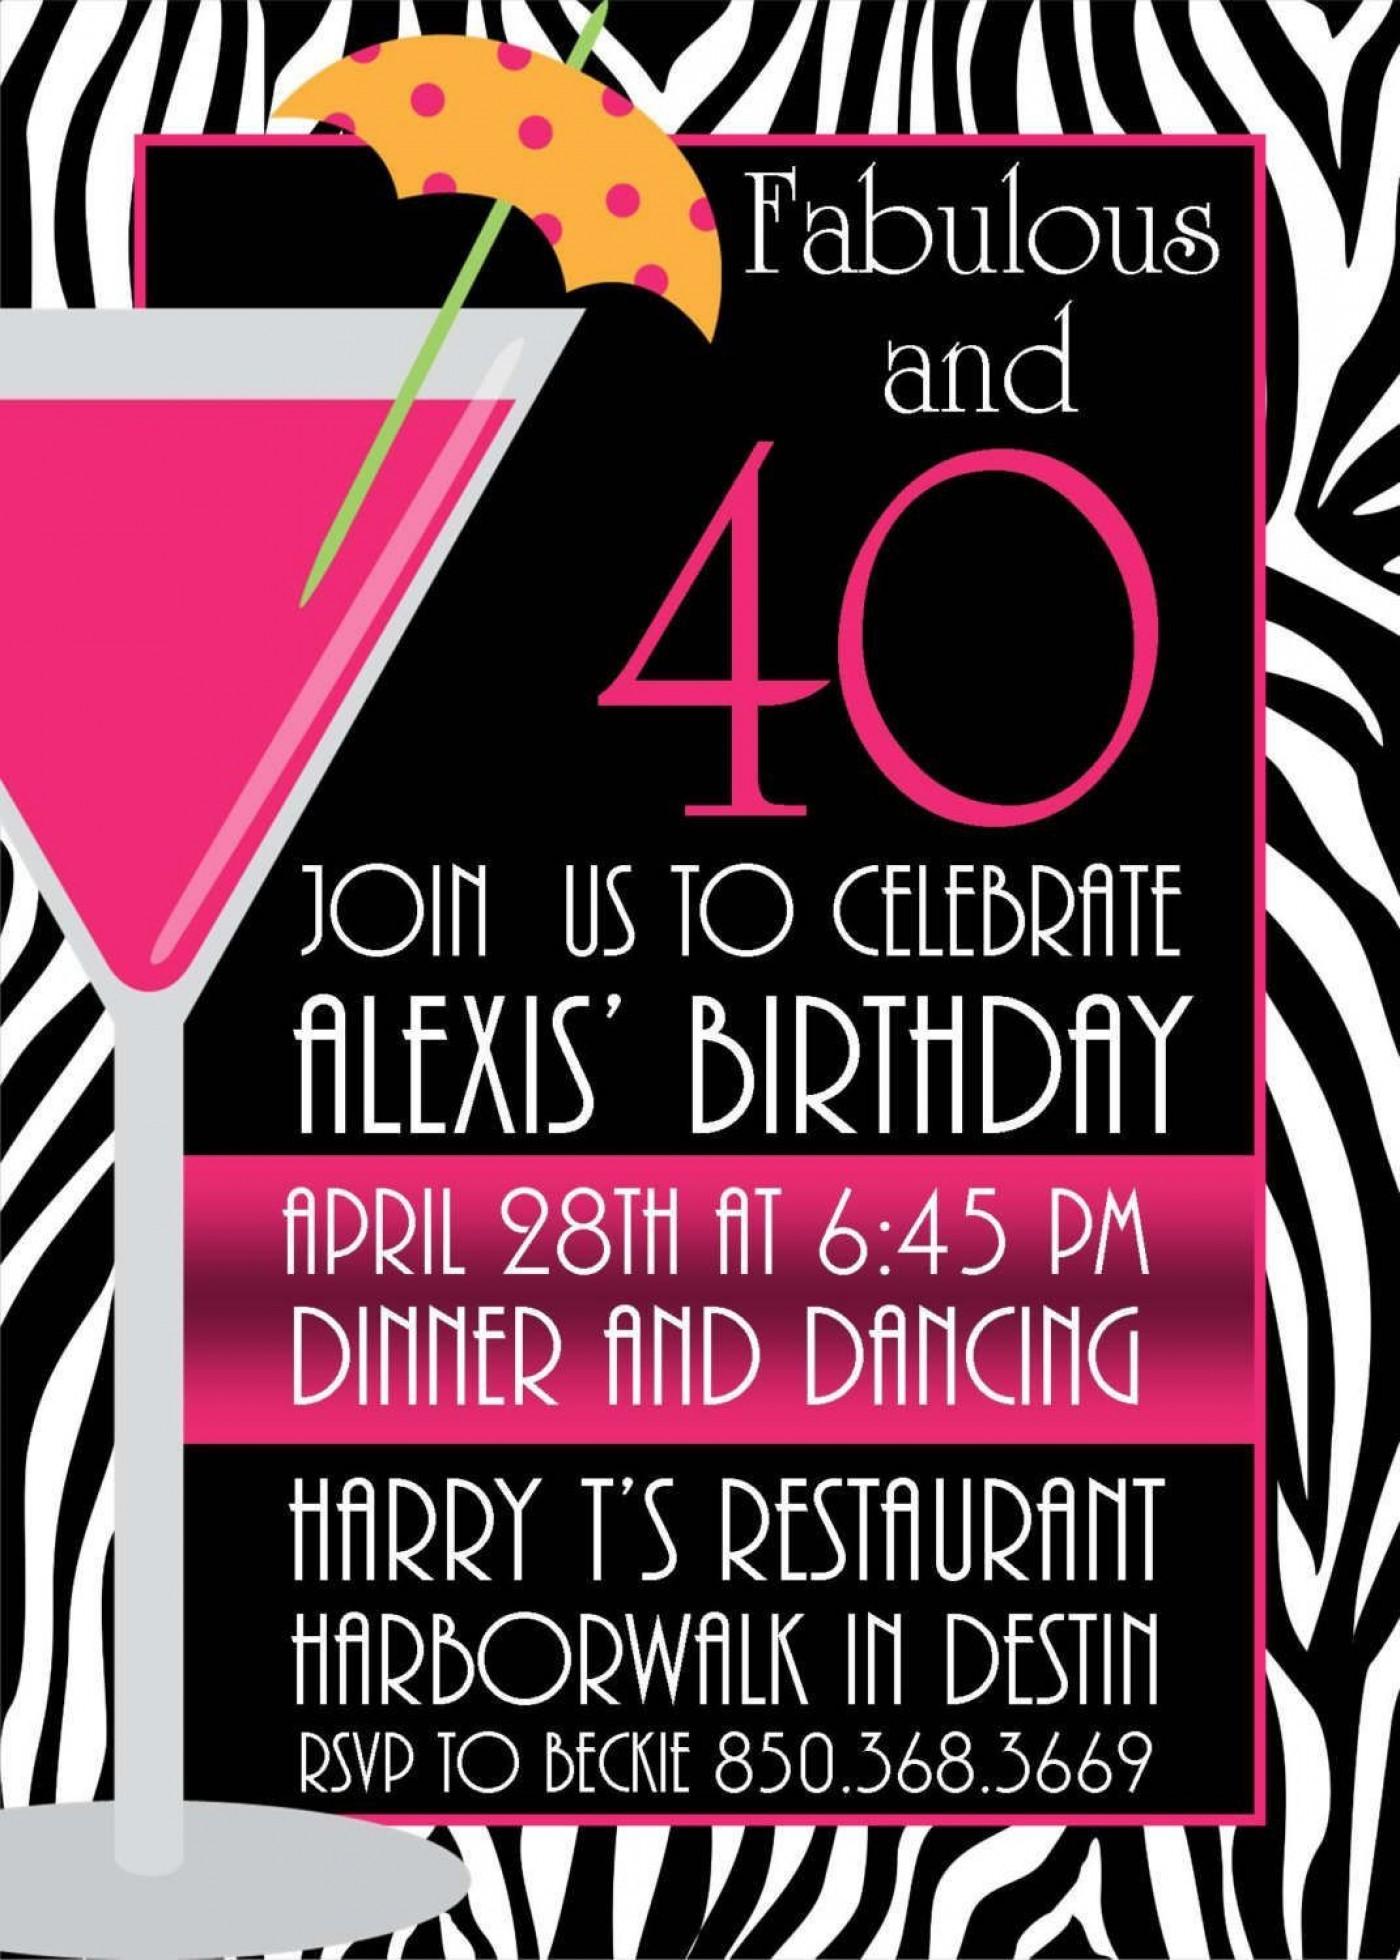 005 Breathtaking 40th Birthday Party Invite Template Free Design 1400